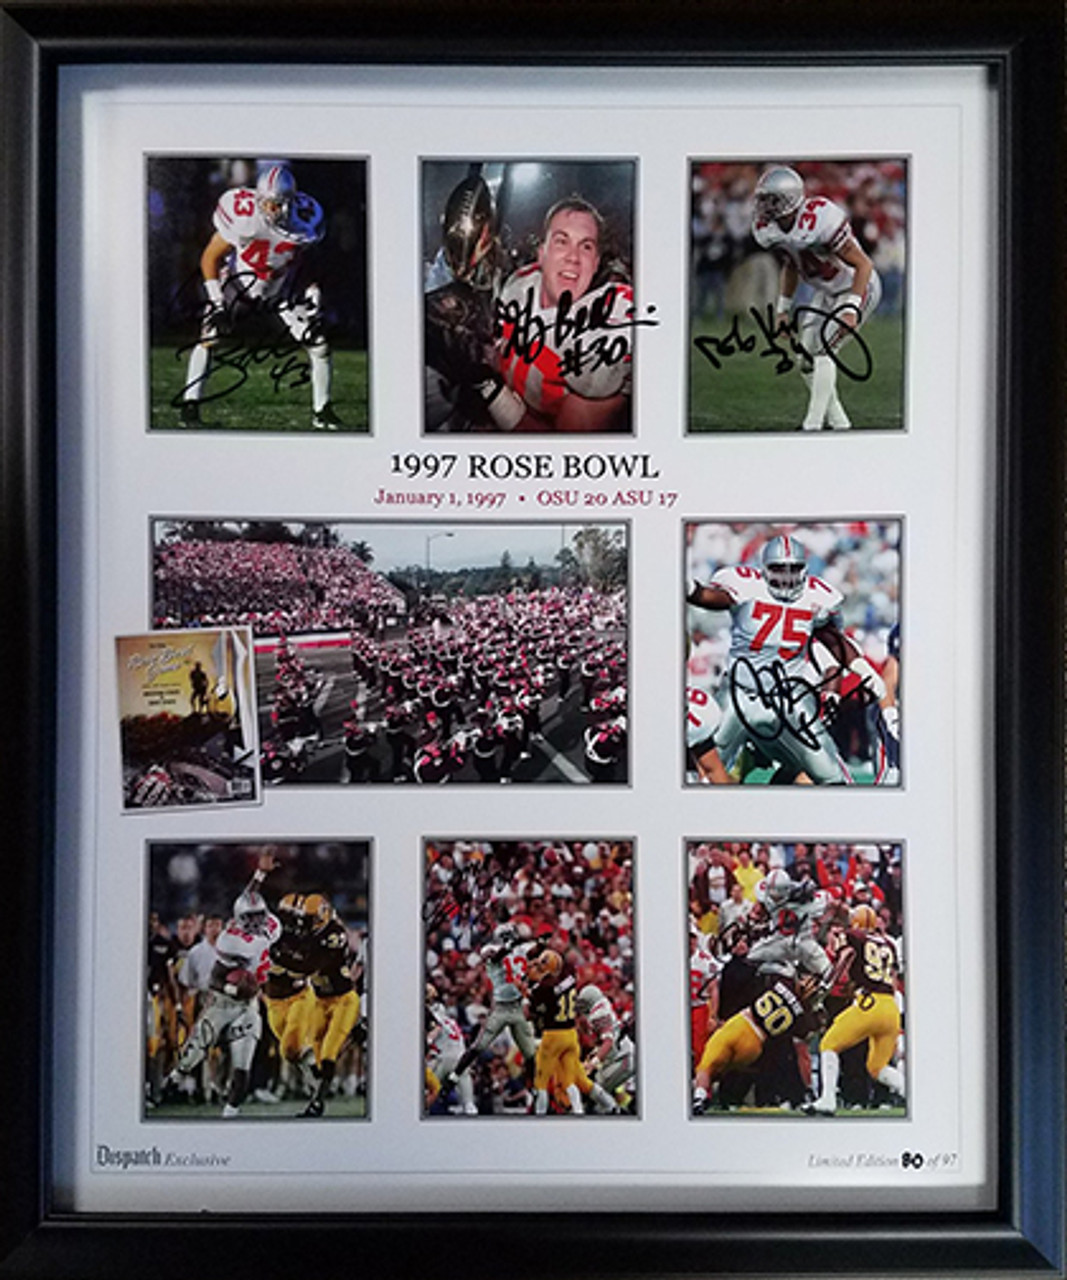 1997 Rose Bowl Ltd. Ed. 2